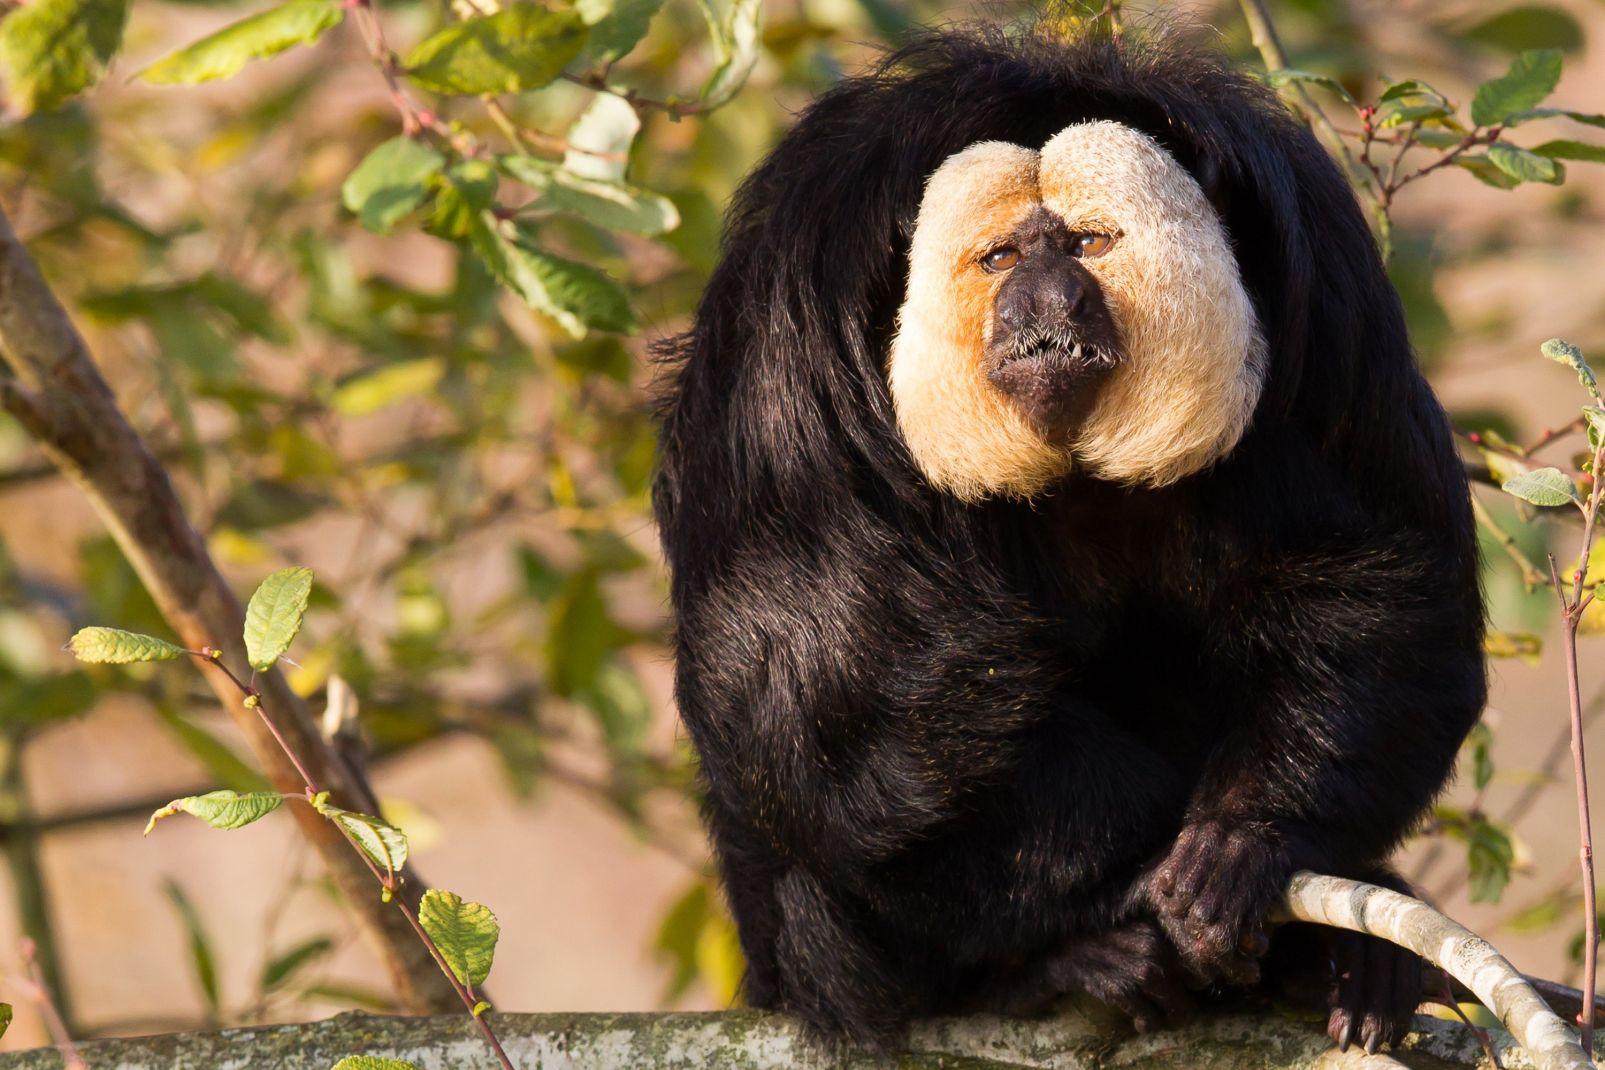 Amérique, guyana, sud, forêt, jungle, saki, singe, primate, animal, faune, mammifère